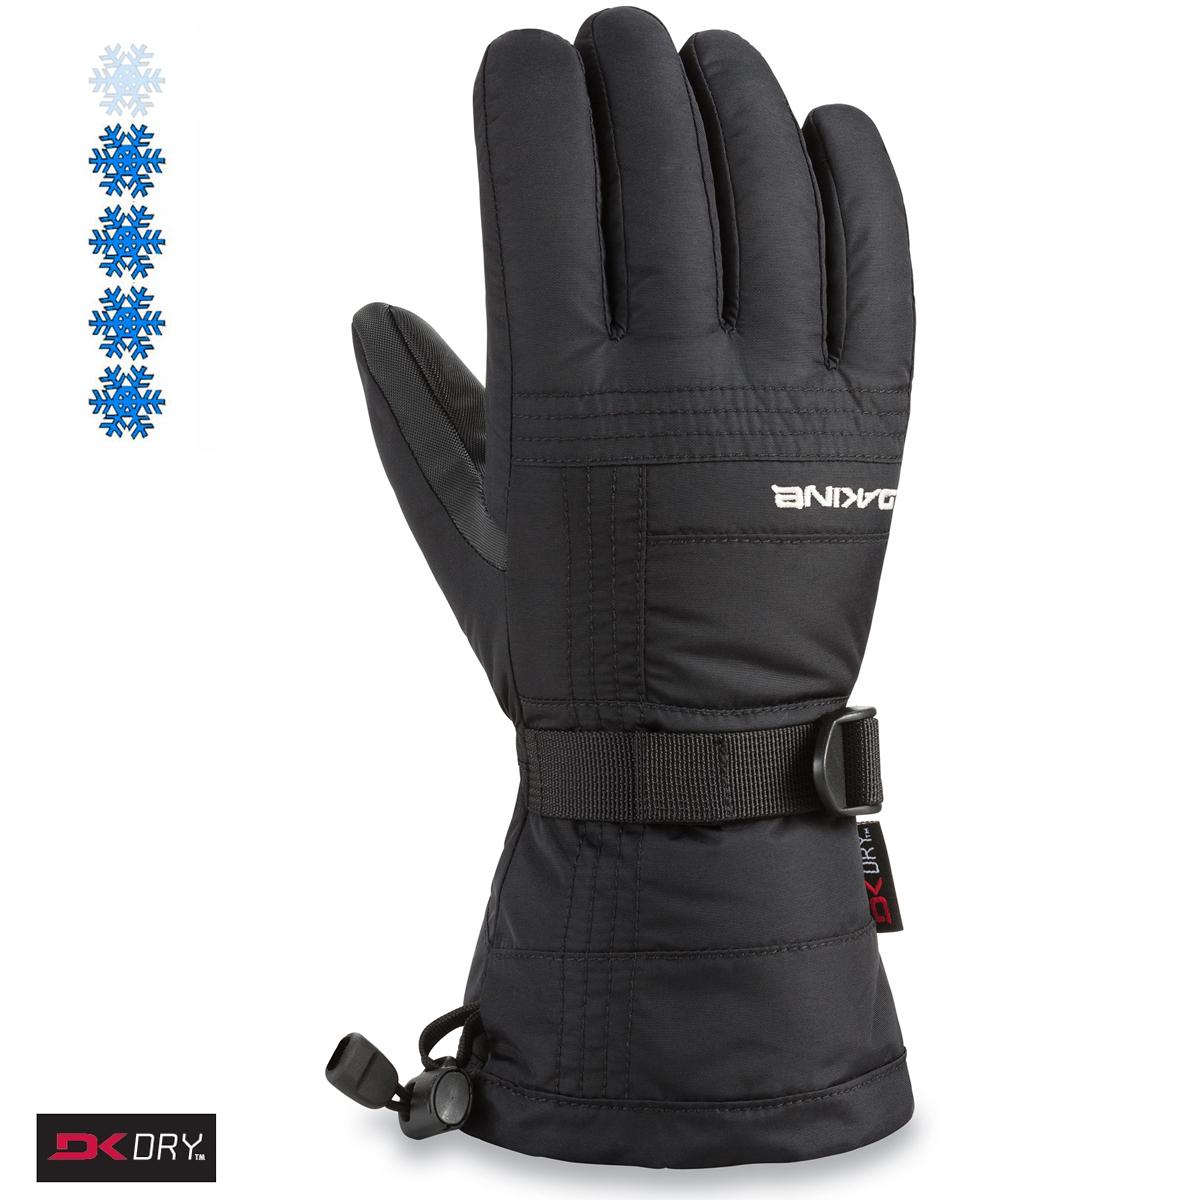 Nowy Jork dobra tekstura urzędnik Dakine Capri Glove Ski- / Snowboard Gloves Black